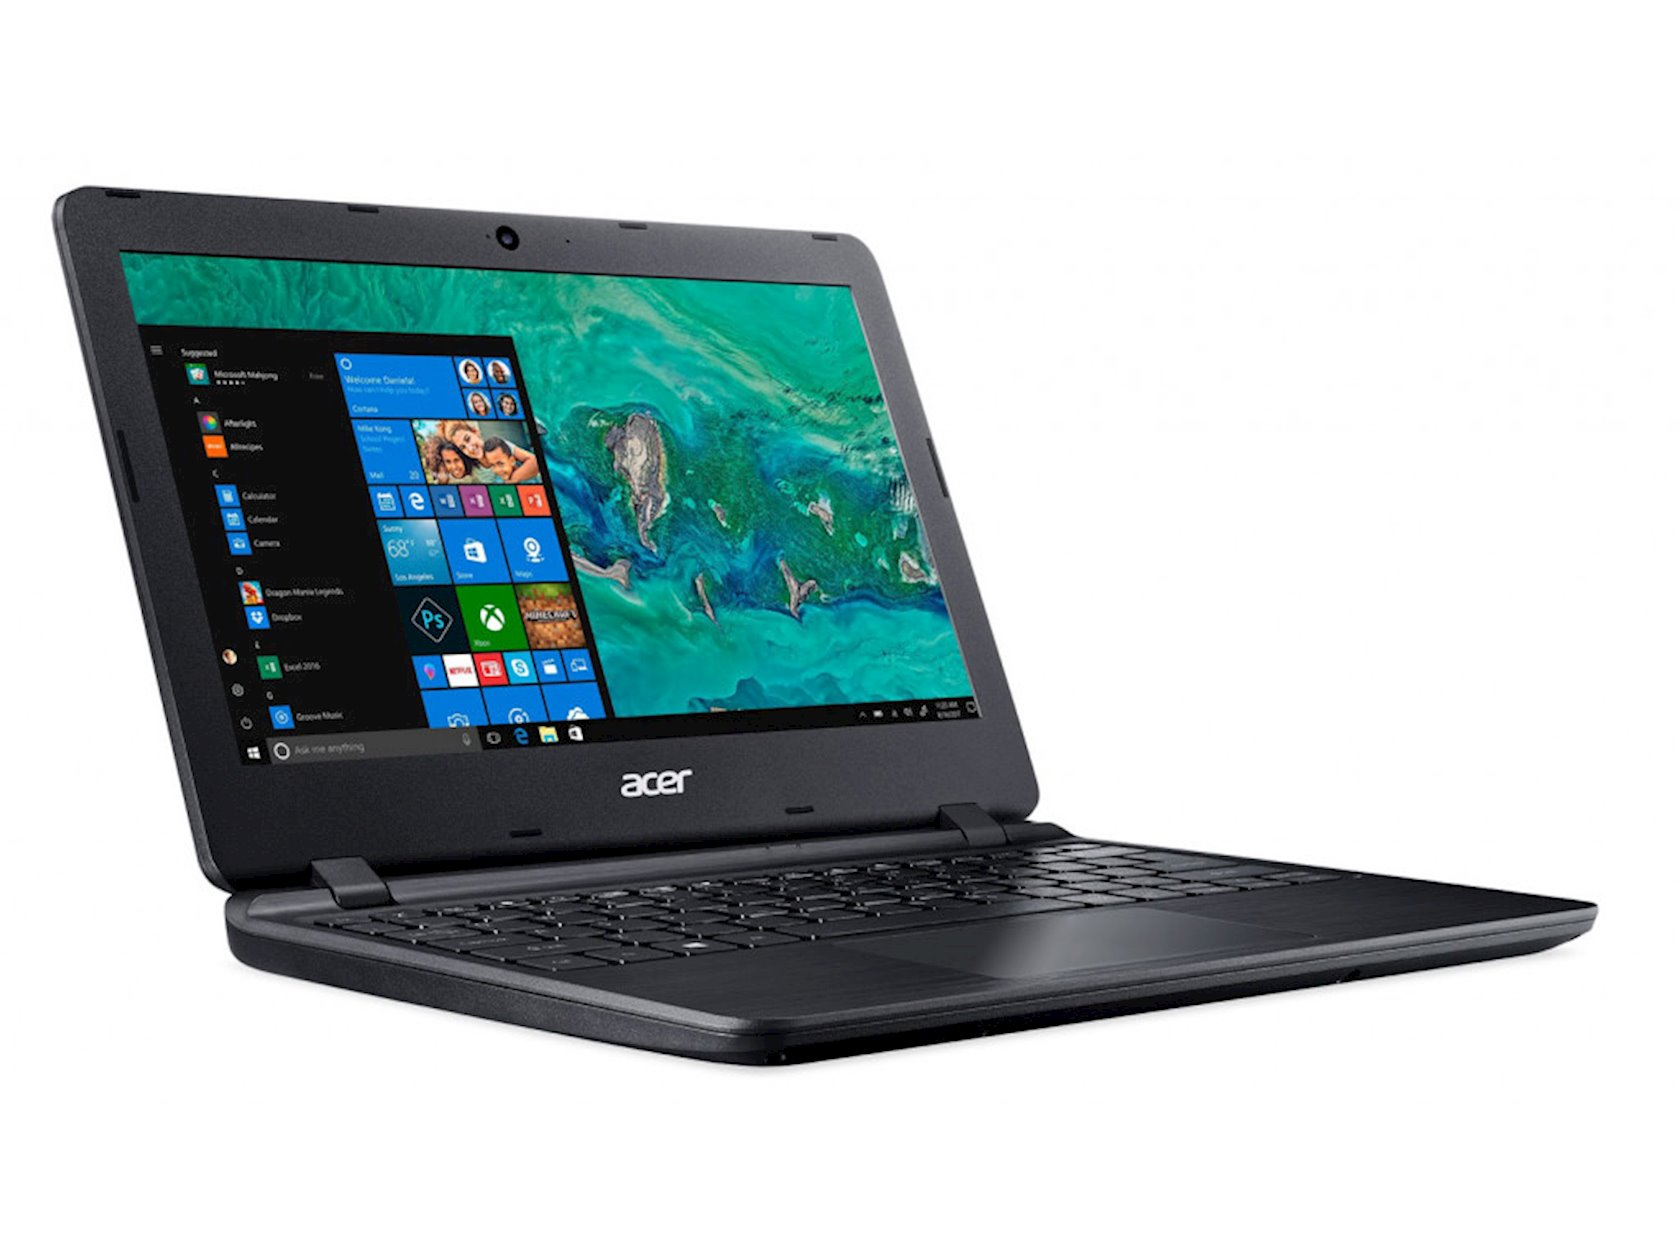 Noutbuk Acer Aspire 1 A111